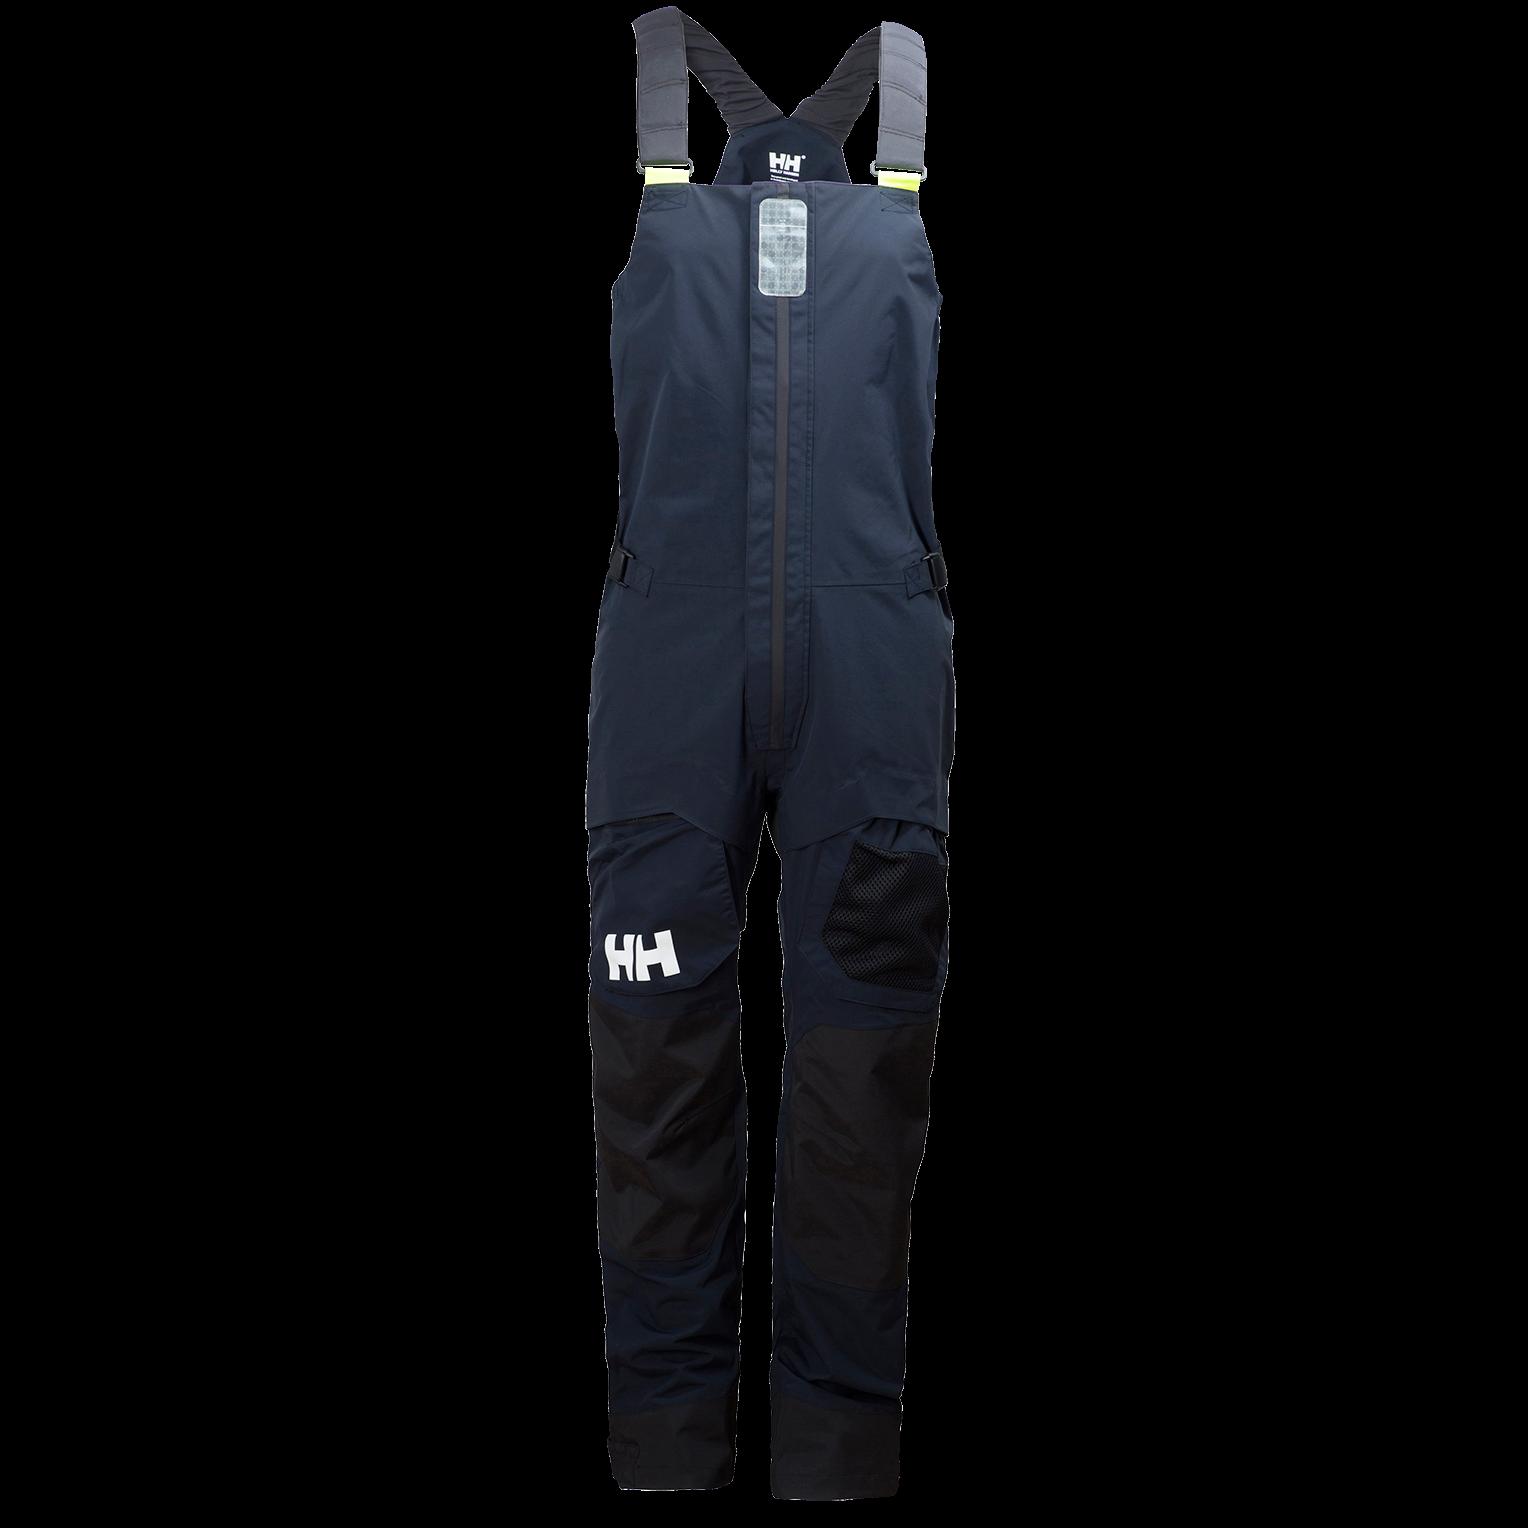 2ab303f325e SKAGEN 2 PANT - Men - Pants - Helly Hansen Official Online Store ...